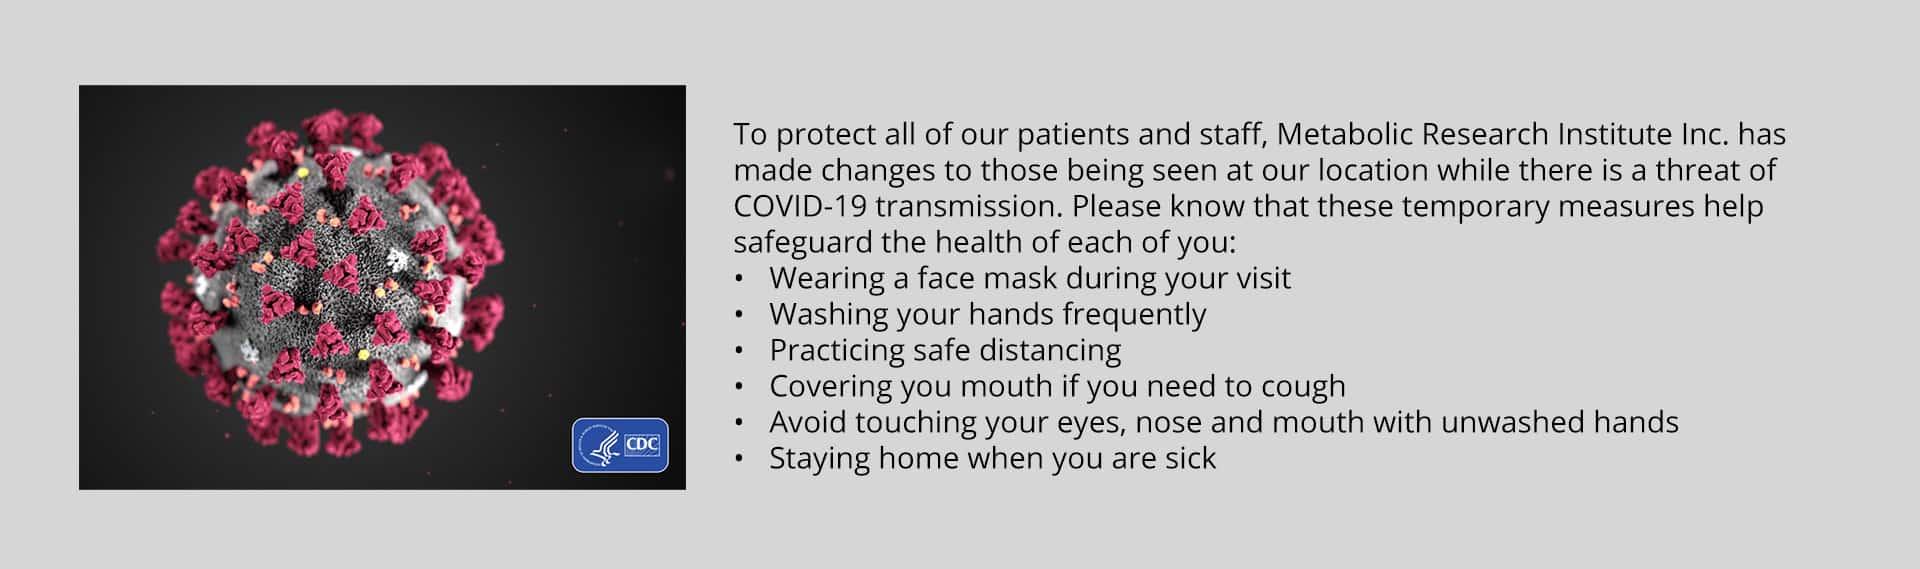 MRI COVID-19 Advisory statement for patients